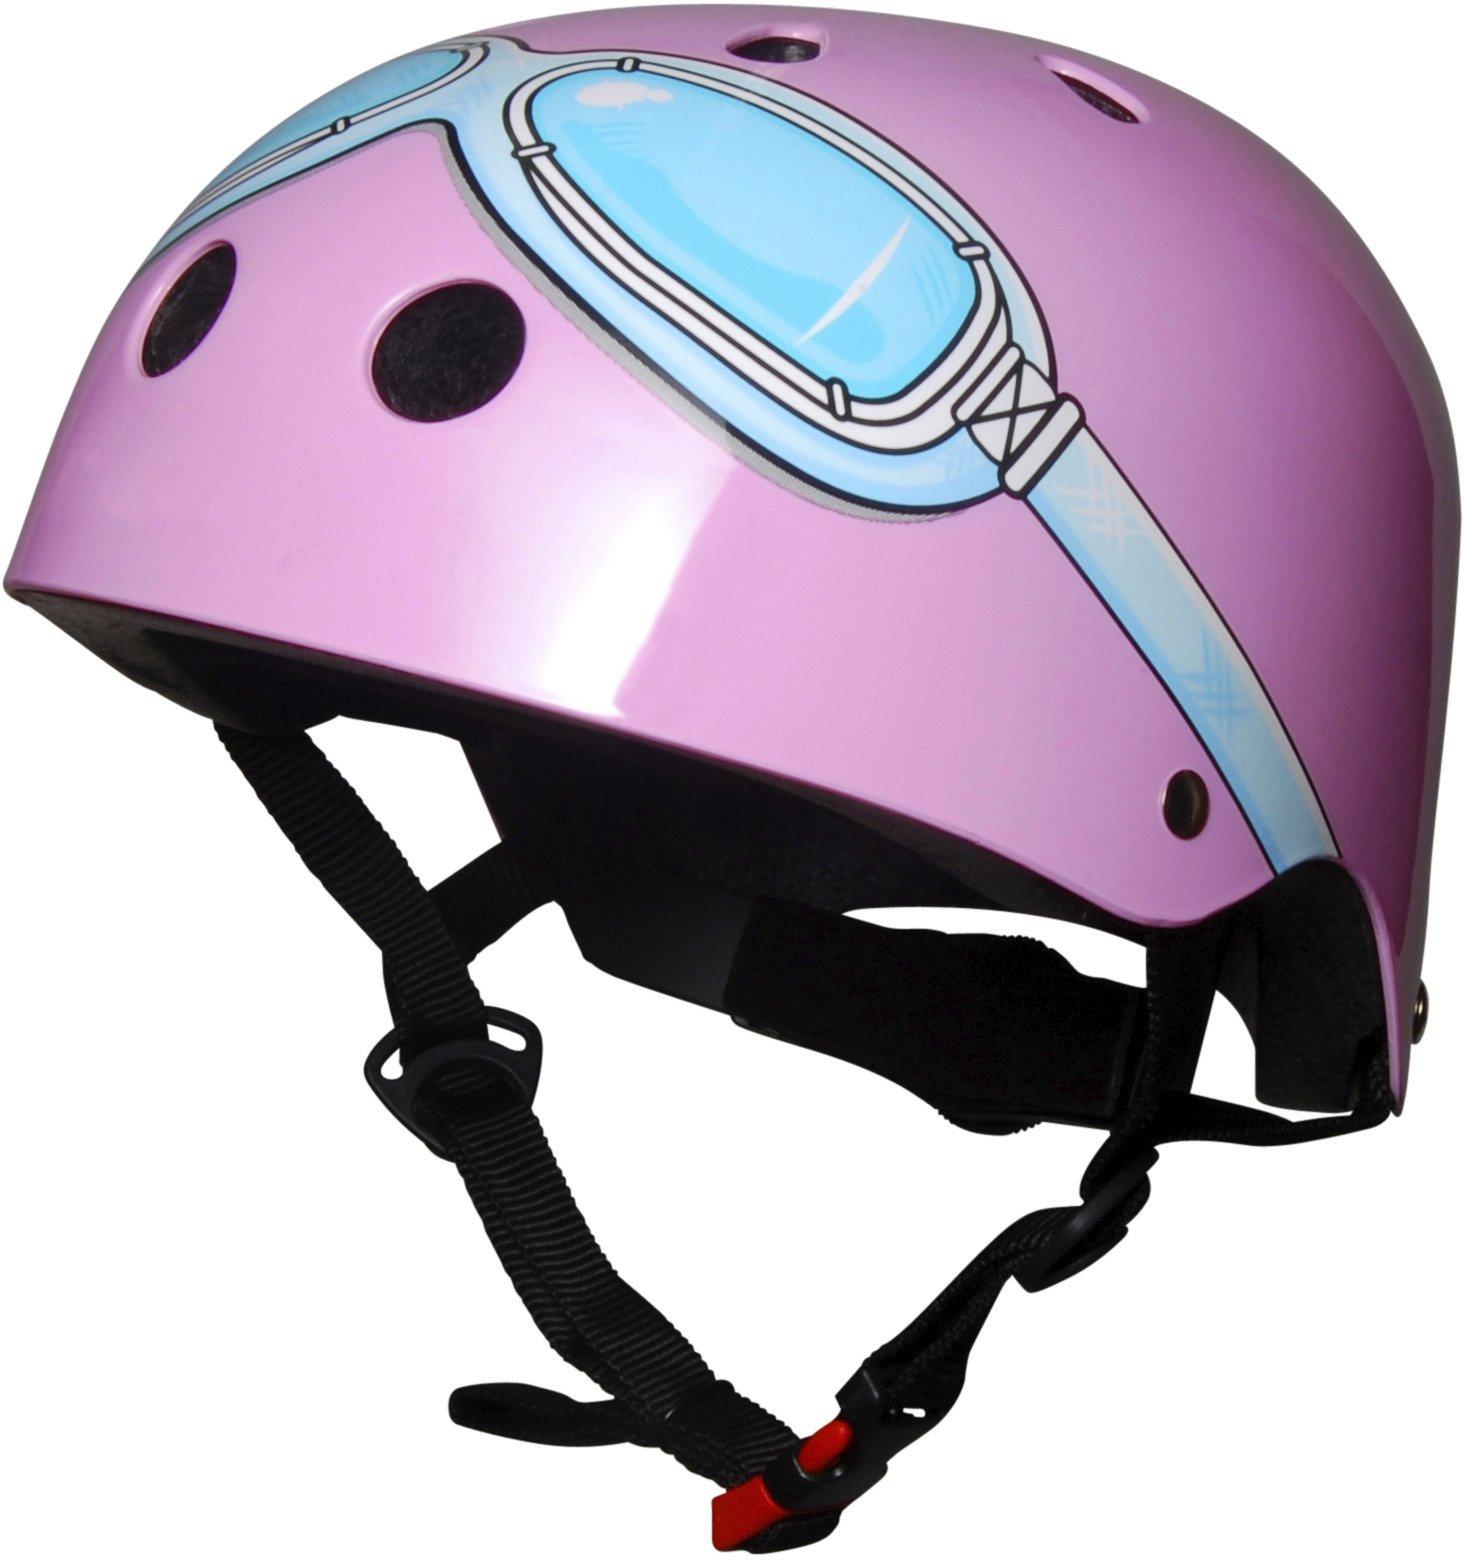 Kiddimoto Kids Patterned Helmet (Pink Goggle, Small)